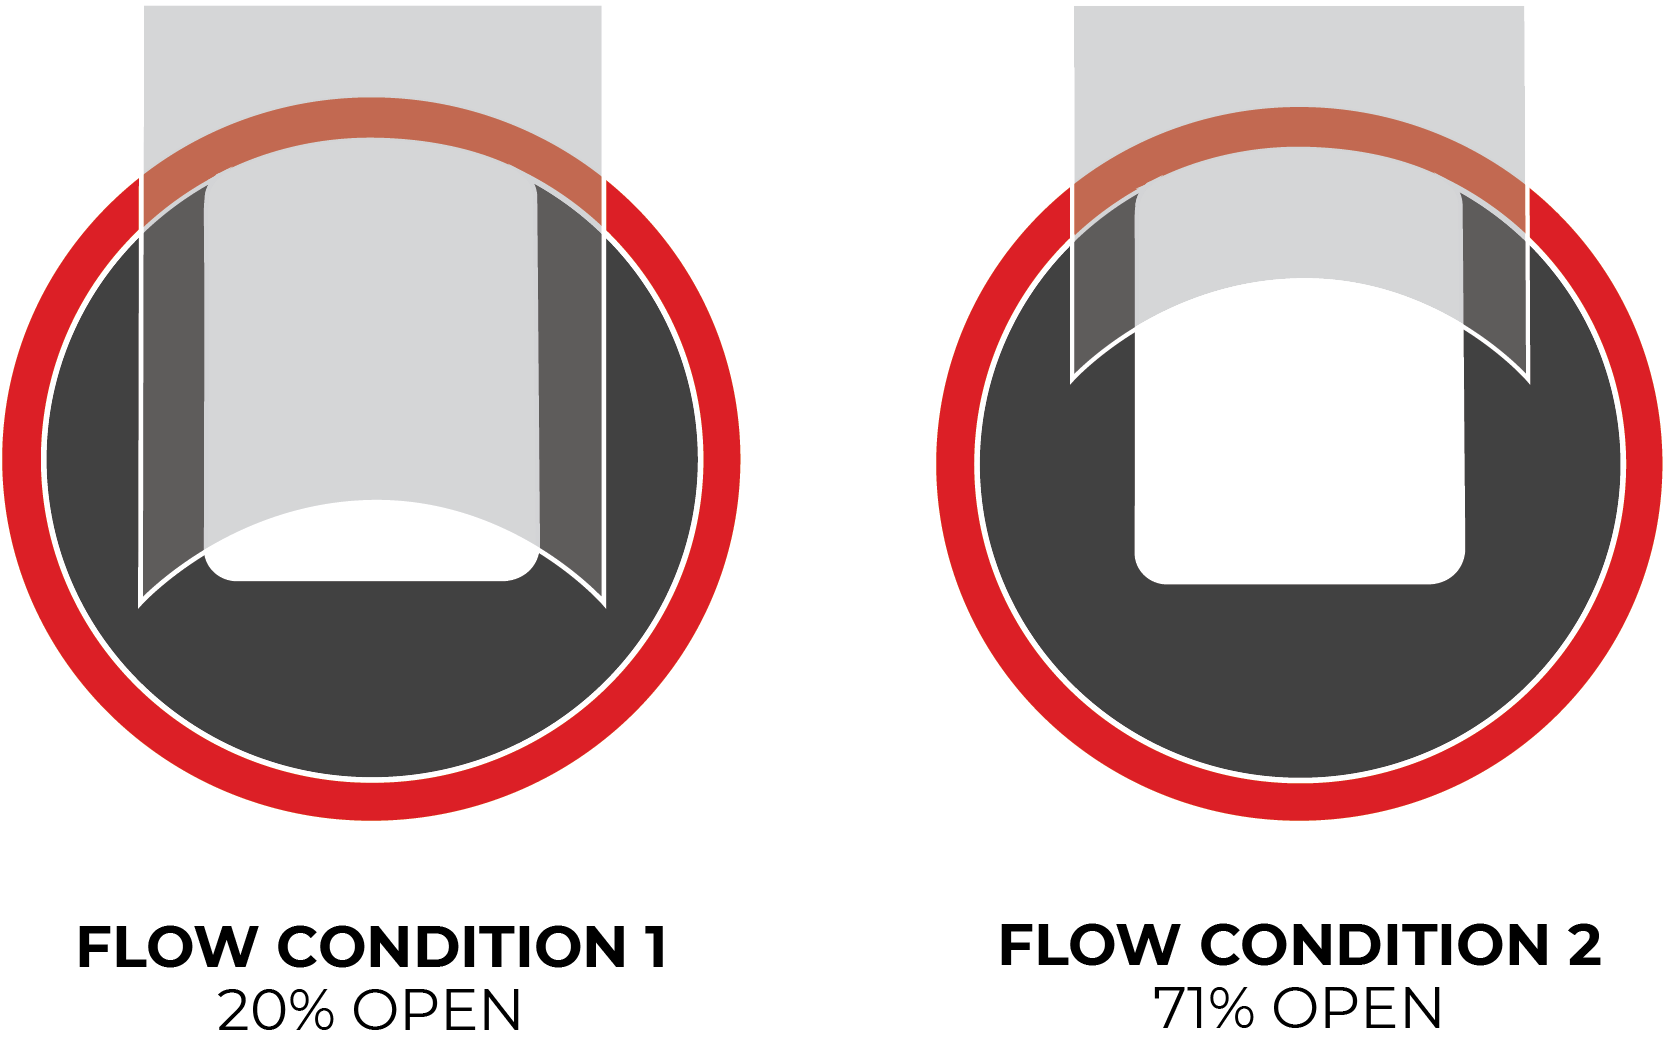 Original Flow Conditions with original SlurryFlo trim design at 20% Open and 71% Open